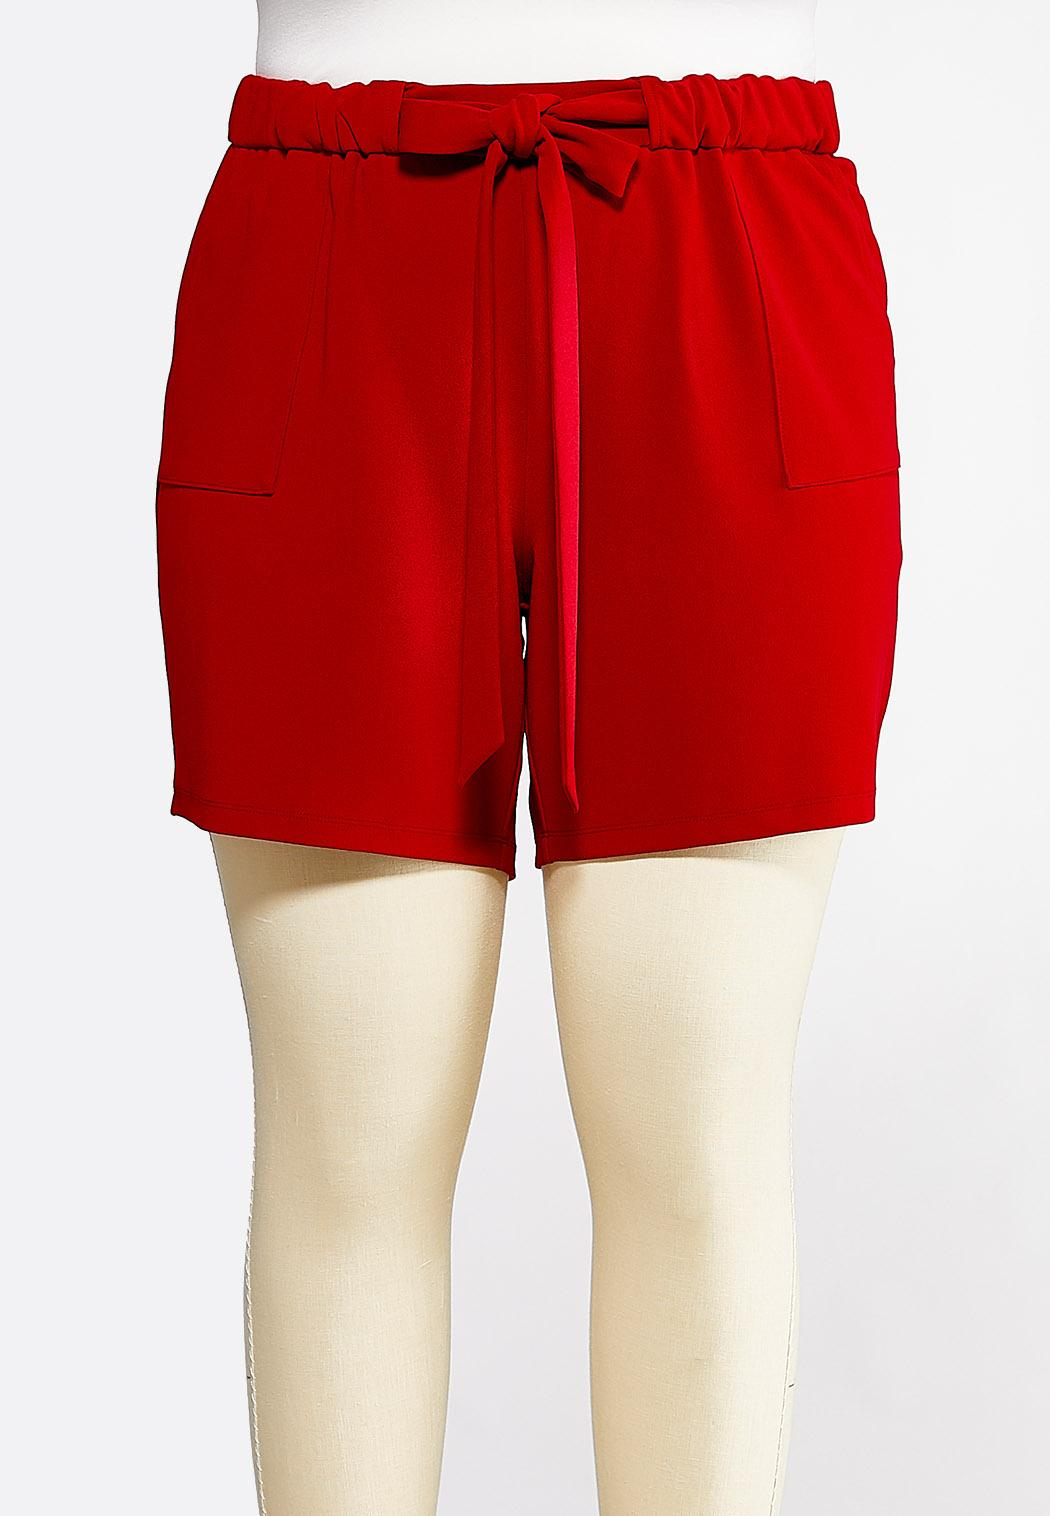 Plus Size Red Tie Waist Shorts